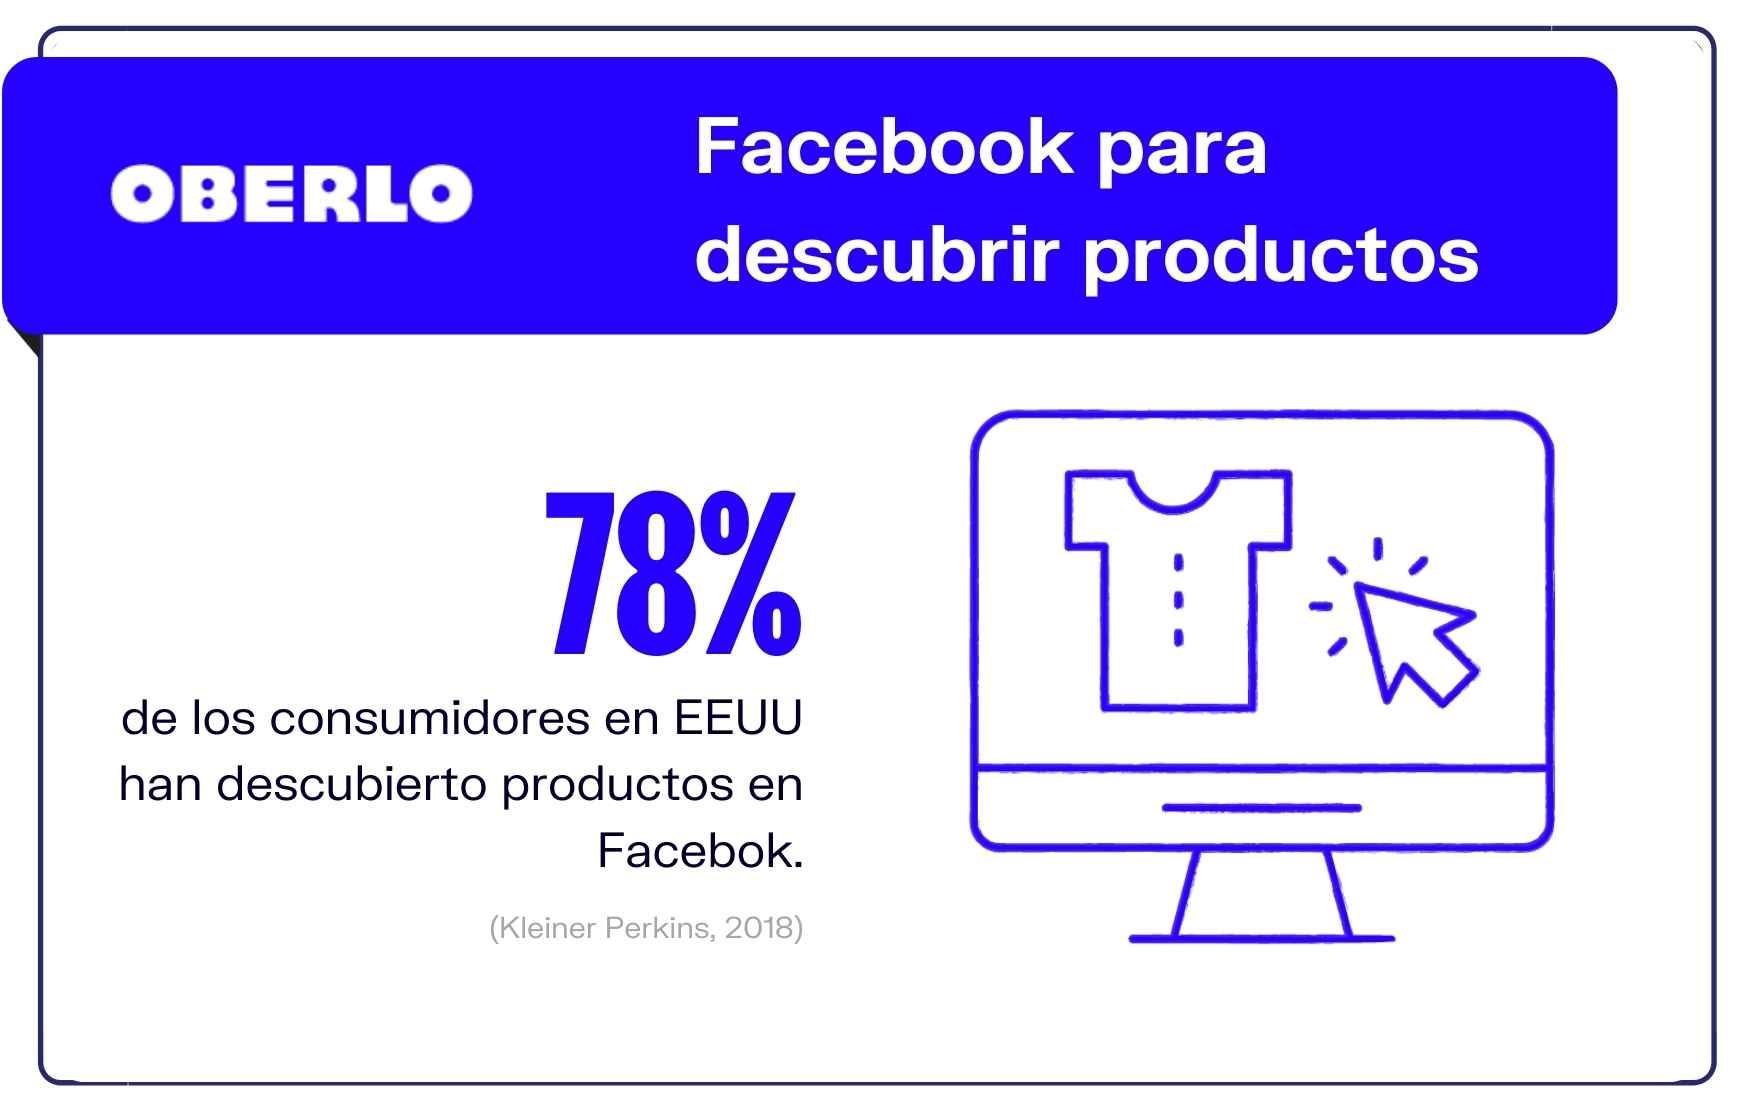 Cifras de Facebook